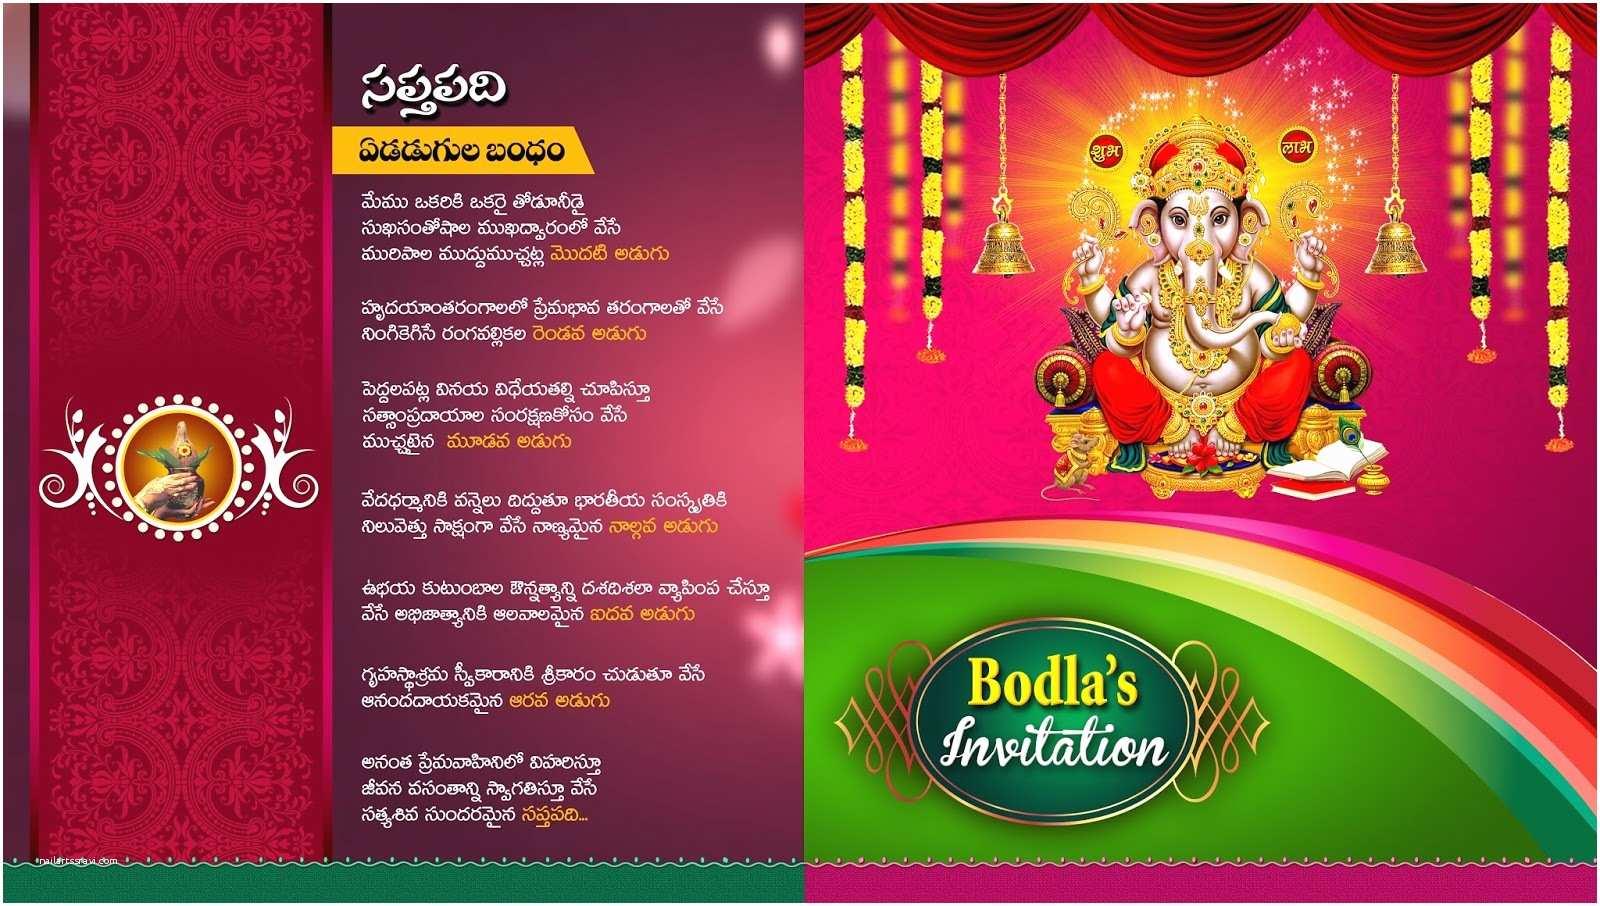 Indian Wedding Invitation Designs Free Download Indian Wedding Card Design Psd Template Free S